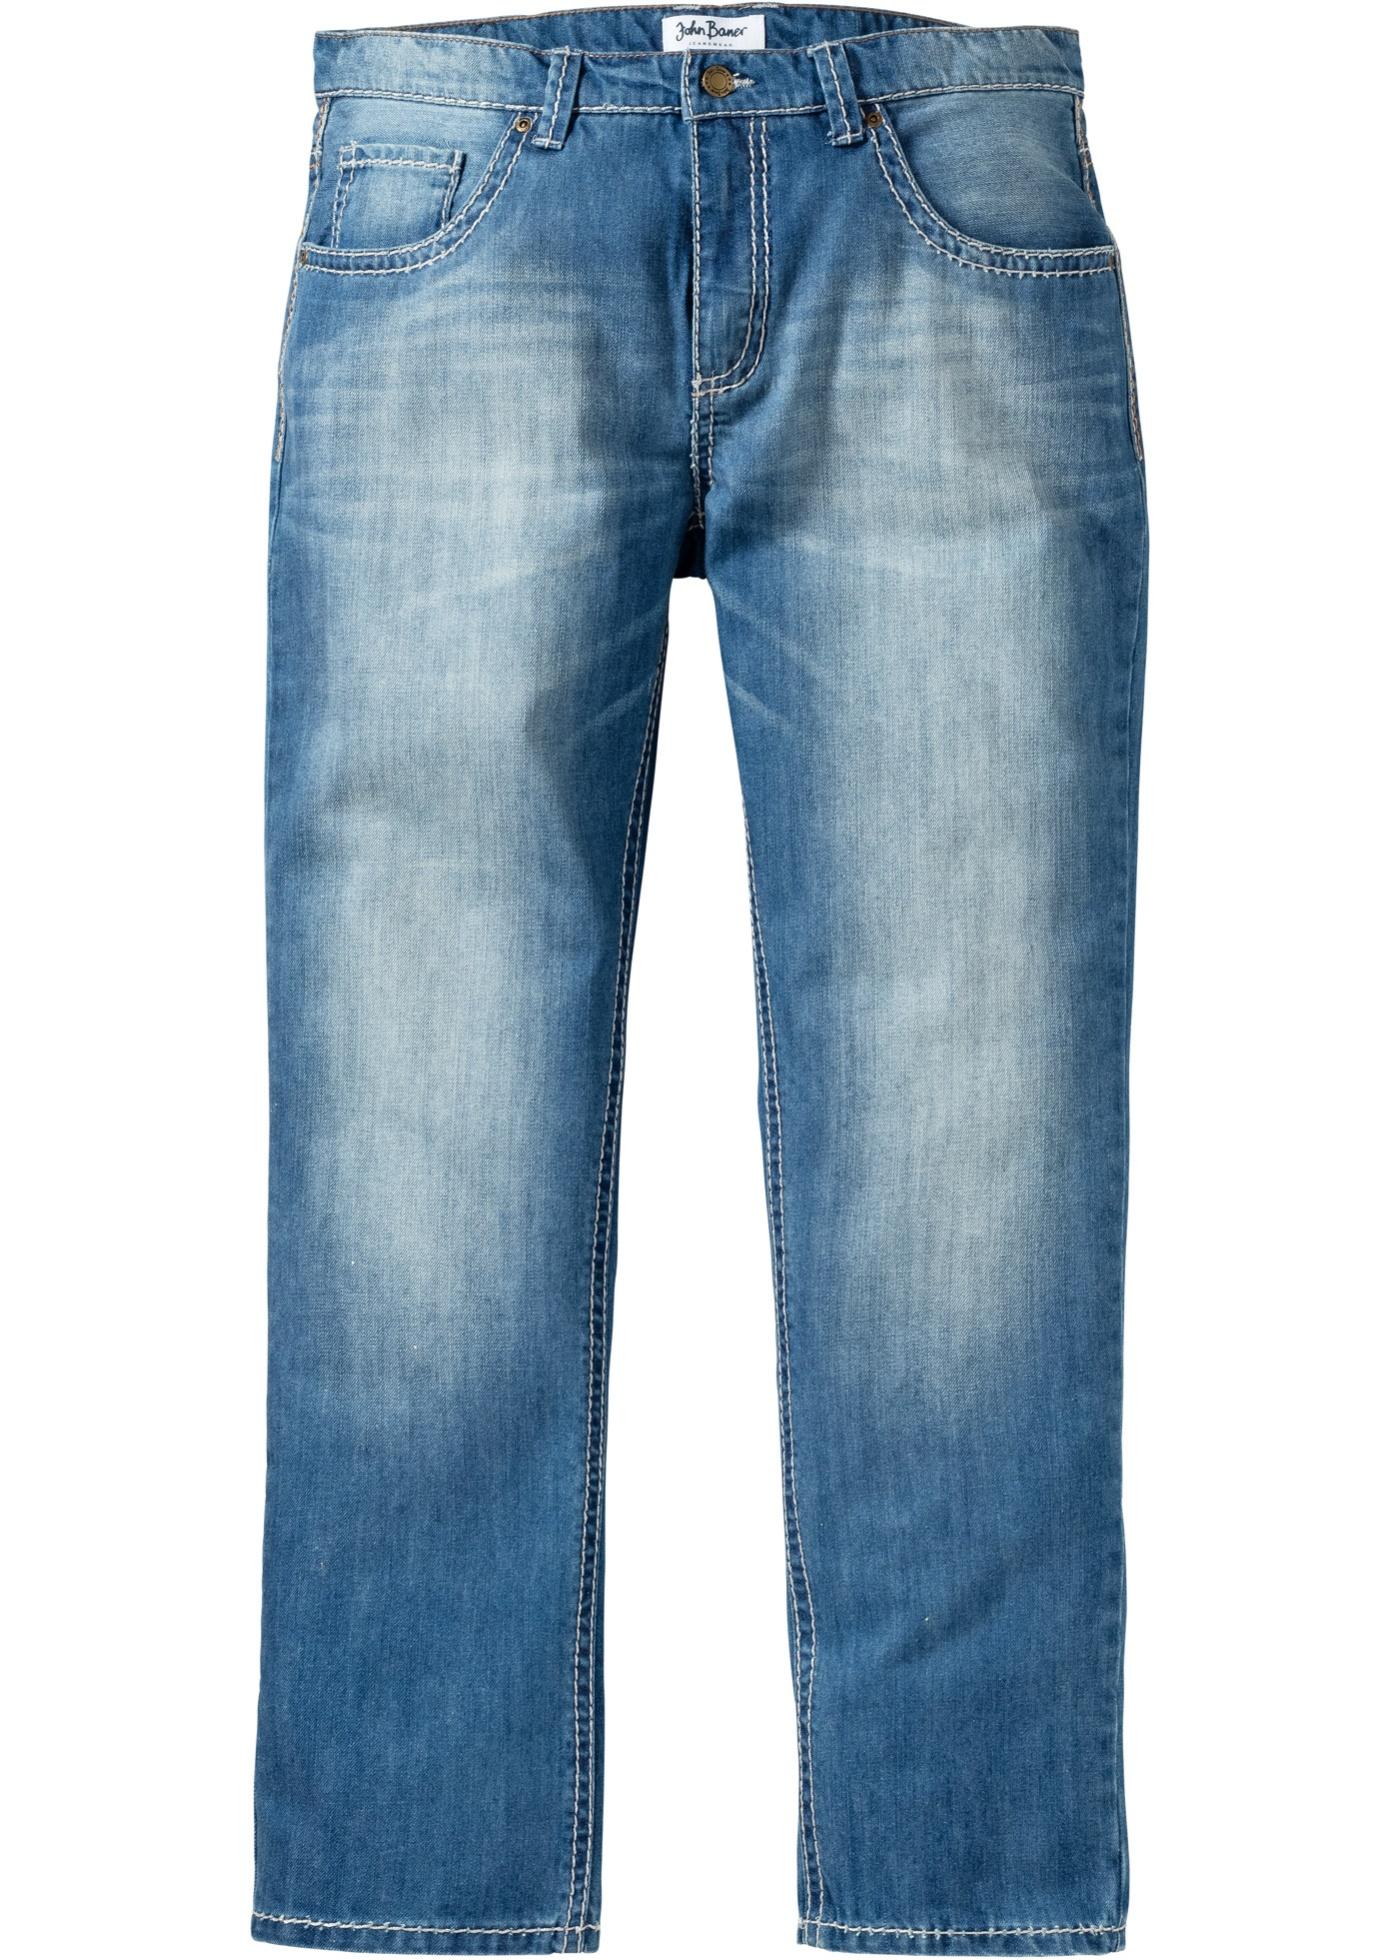 Bonprix SE - Jeans, normal passform, raka ben 359.00